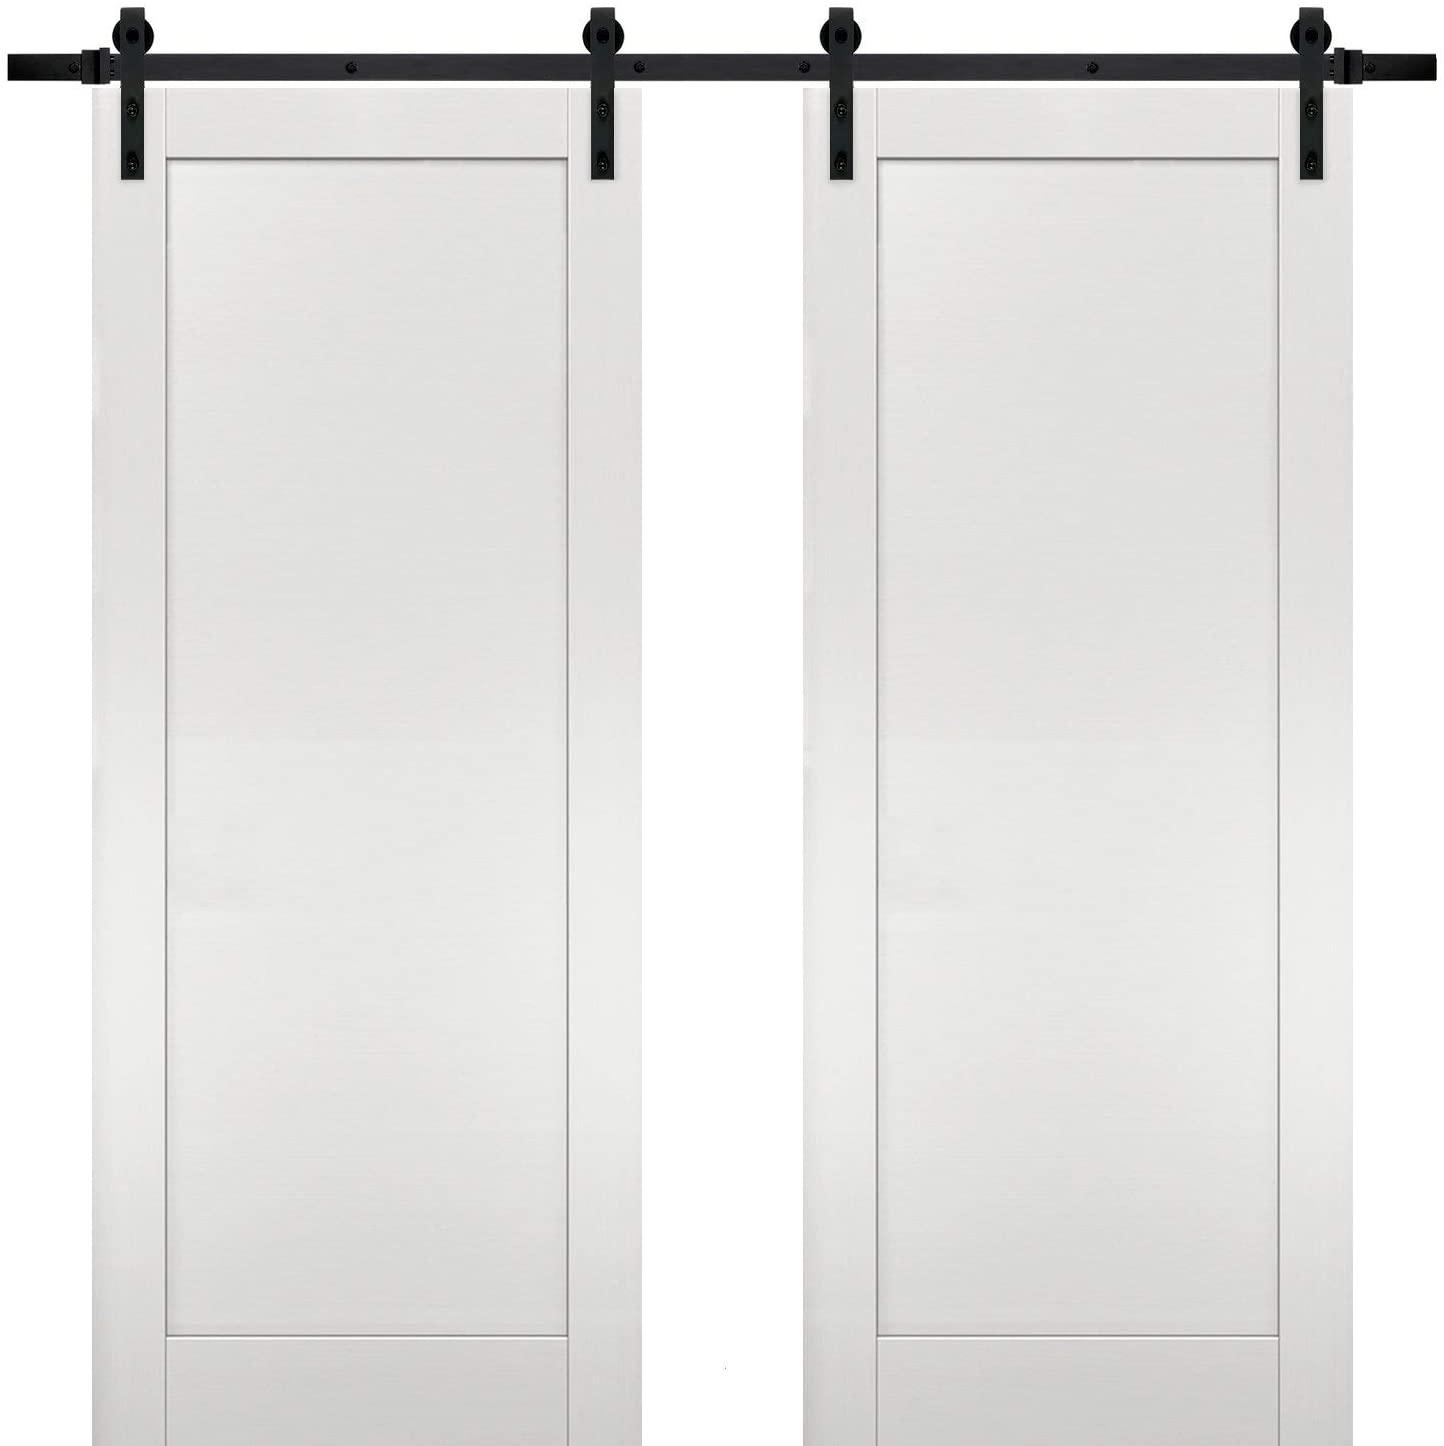 Sliding Double Barn Doors 64 x 80 with Hardware | Quadro 4111 White Ash | Top Mount 13FT Rail Hangers Sturdy Set | Modern Solid Panel Interior Hall Bedroom Bathroom Door